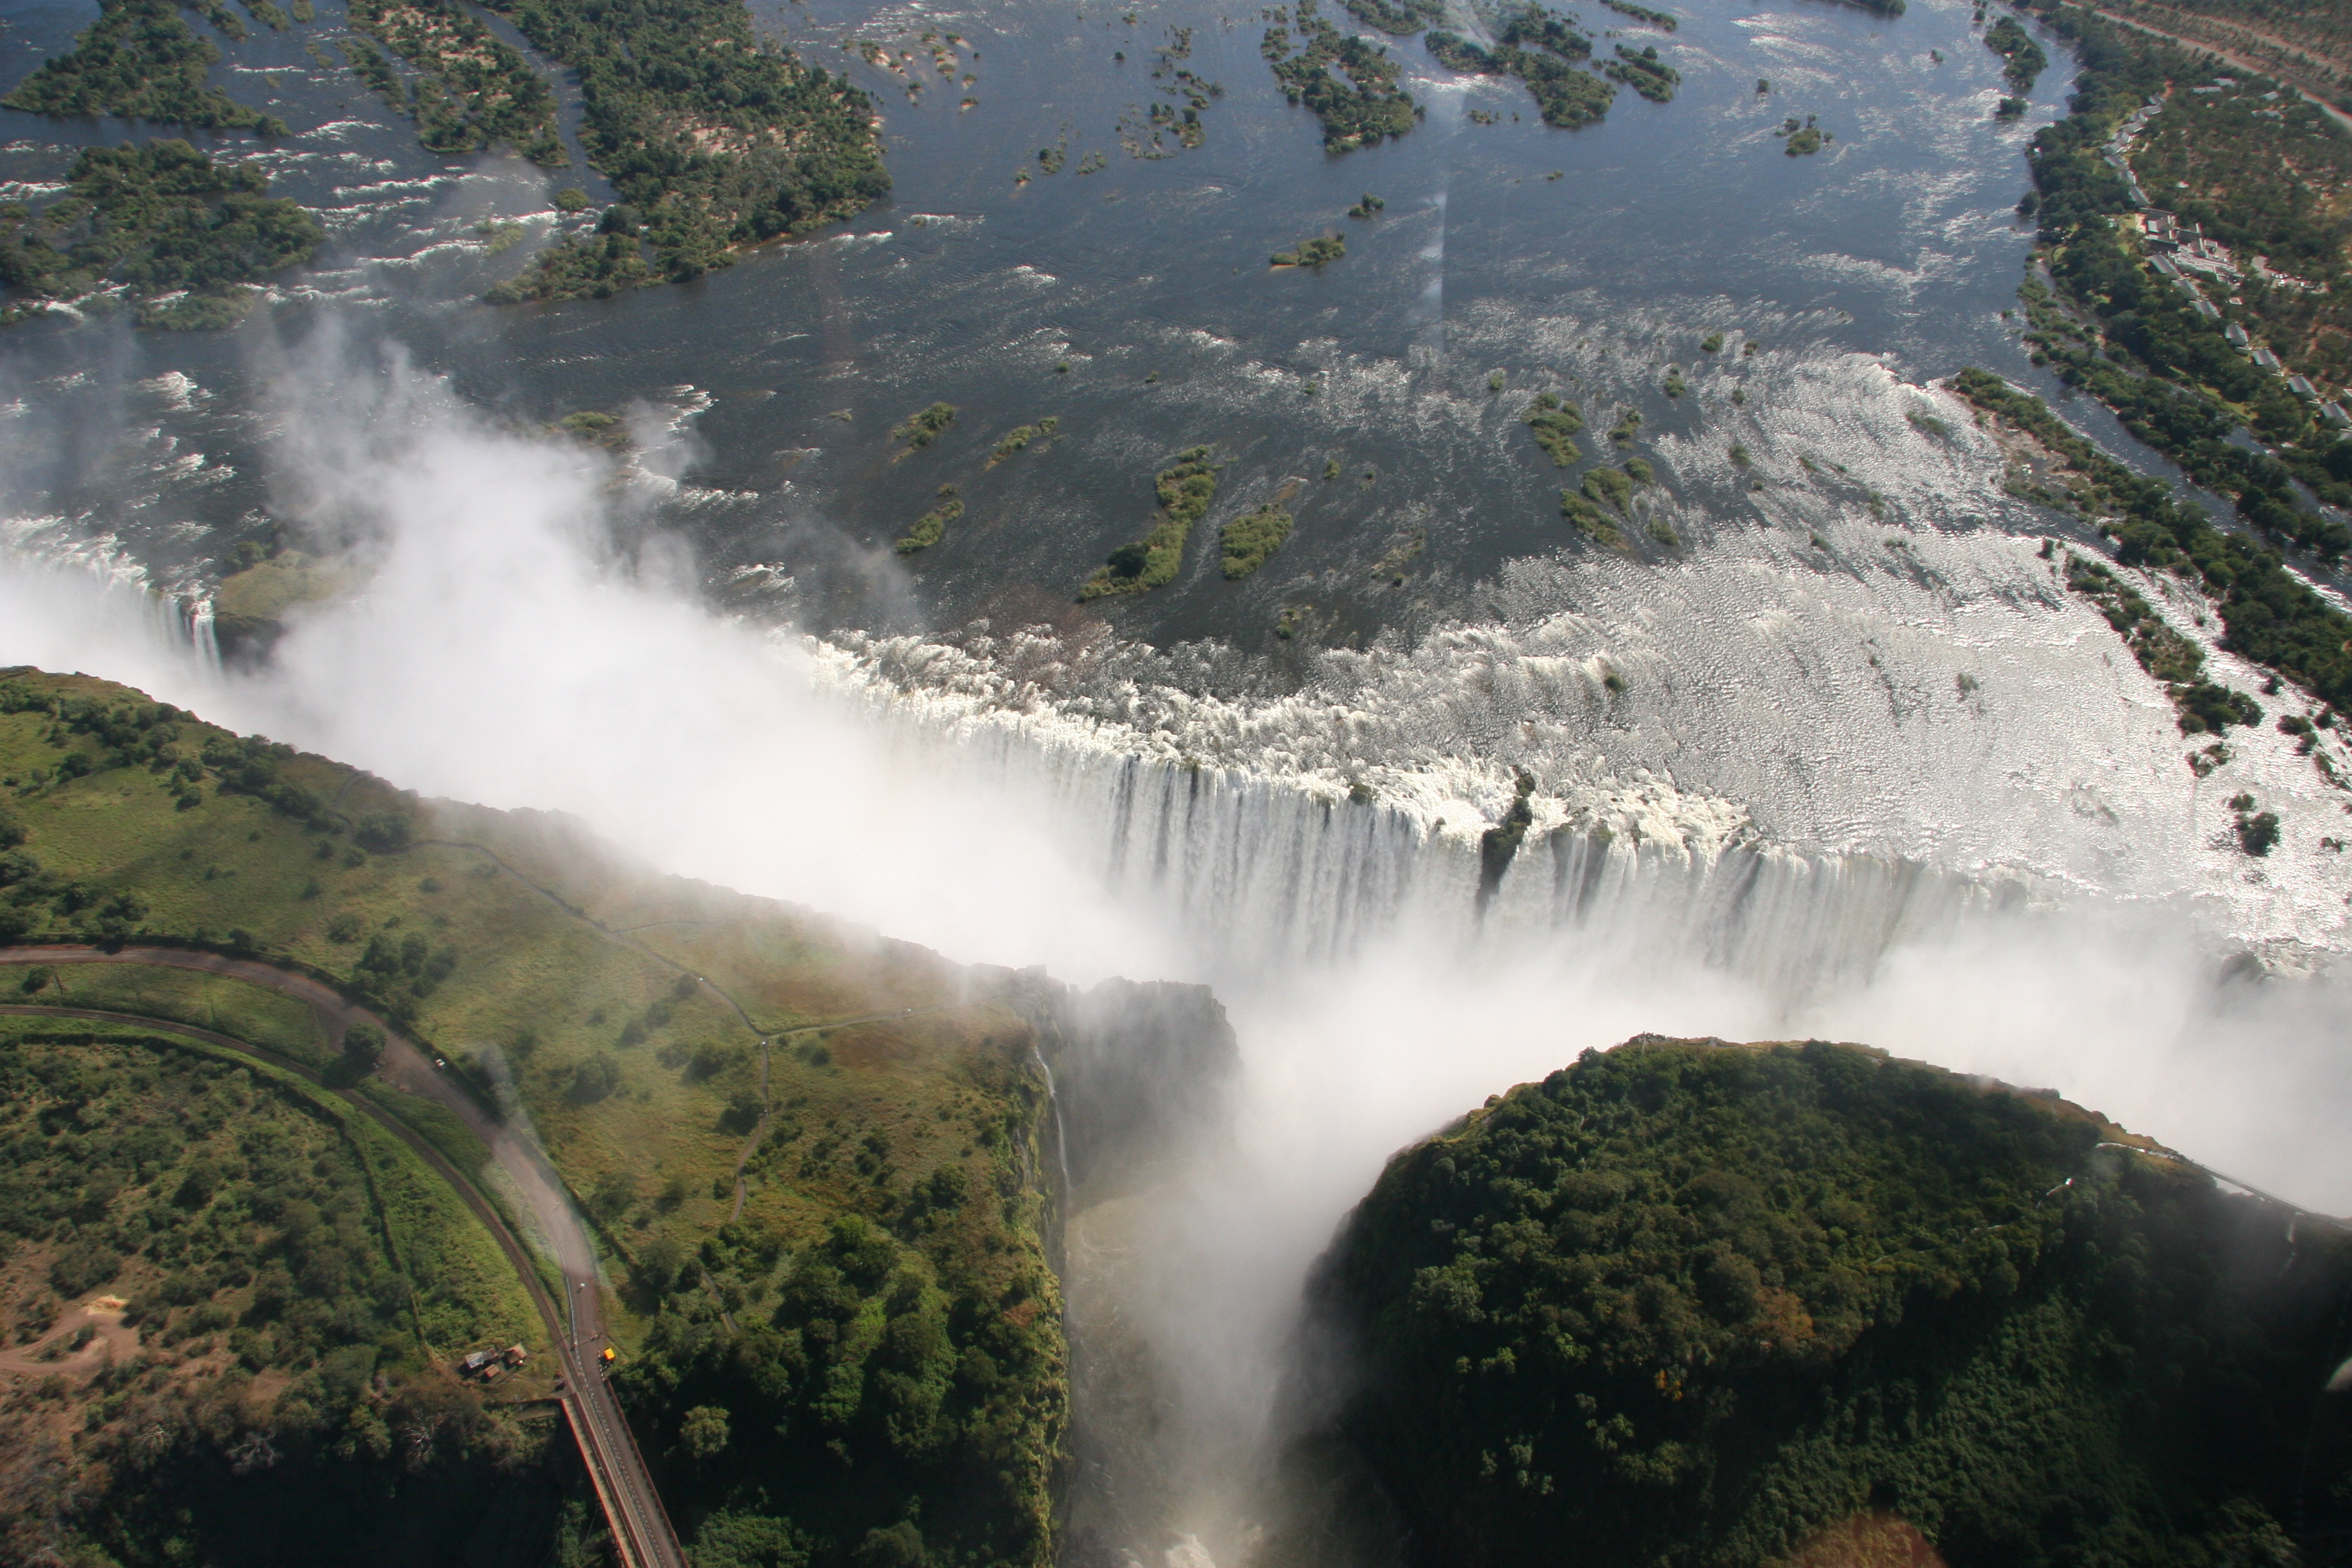 [47+] Victoria Falls Wallpaper Pictures on WallpaperSafari